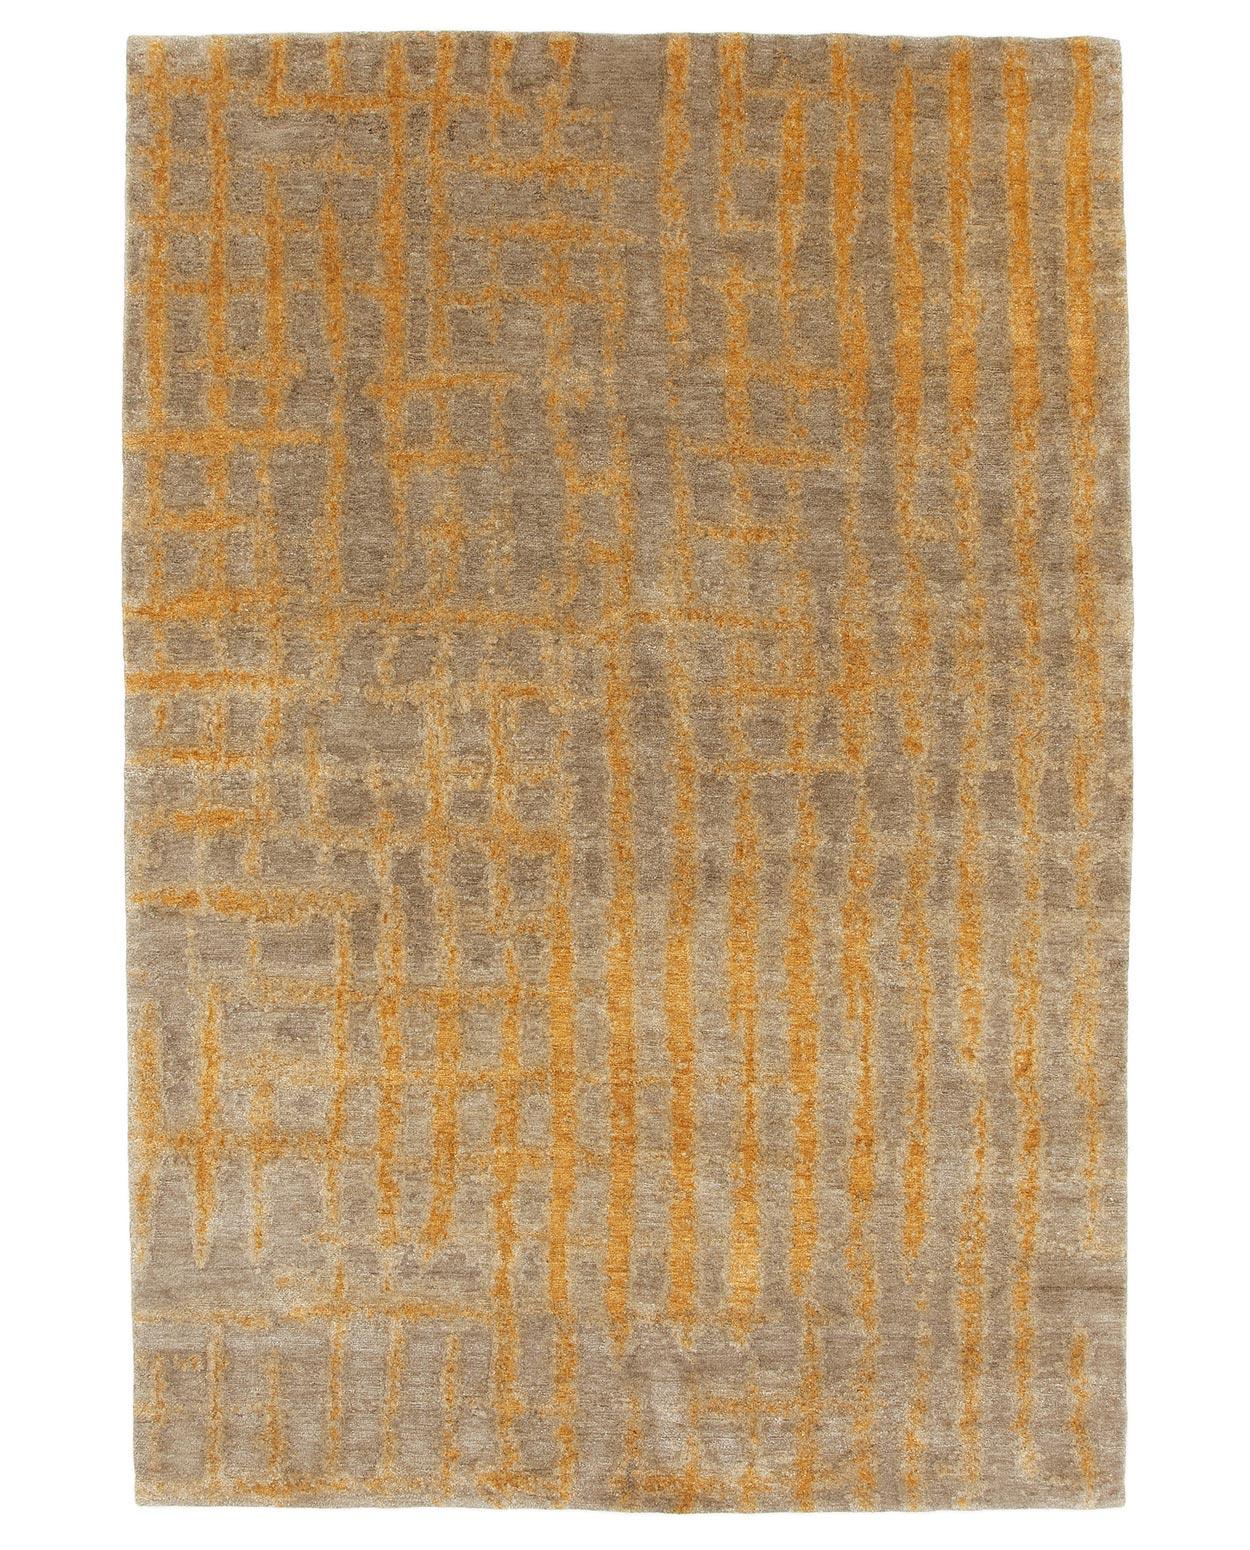 Grid, Saffron (Arky Robbins)